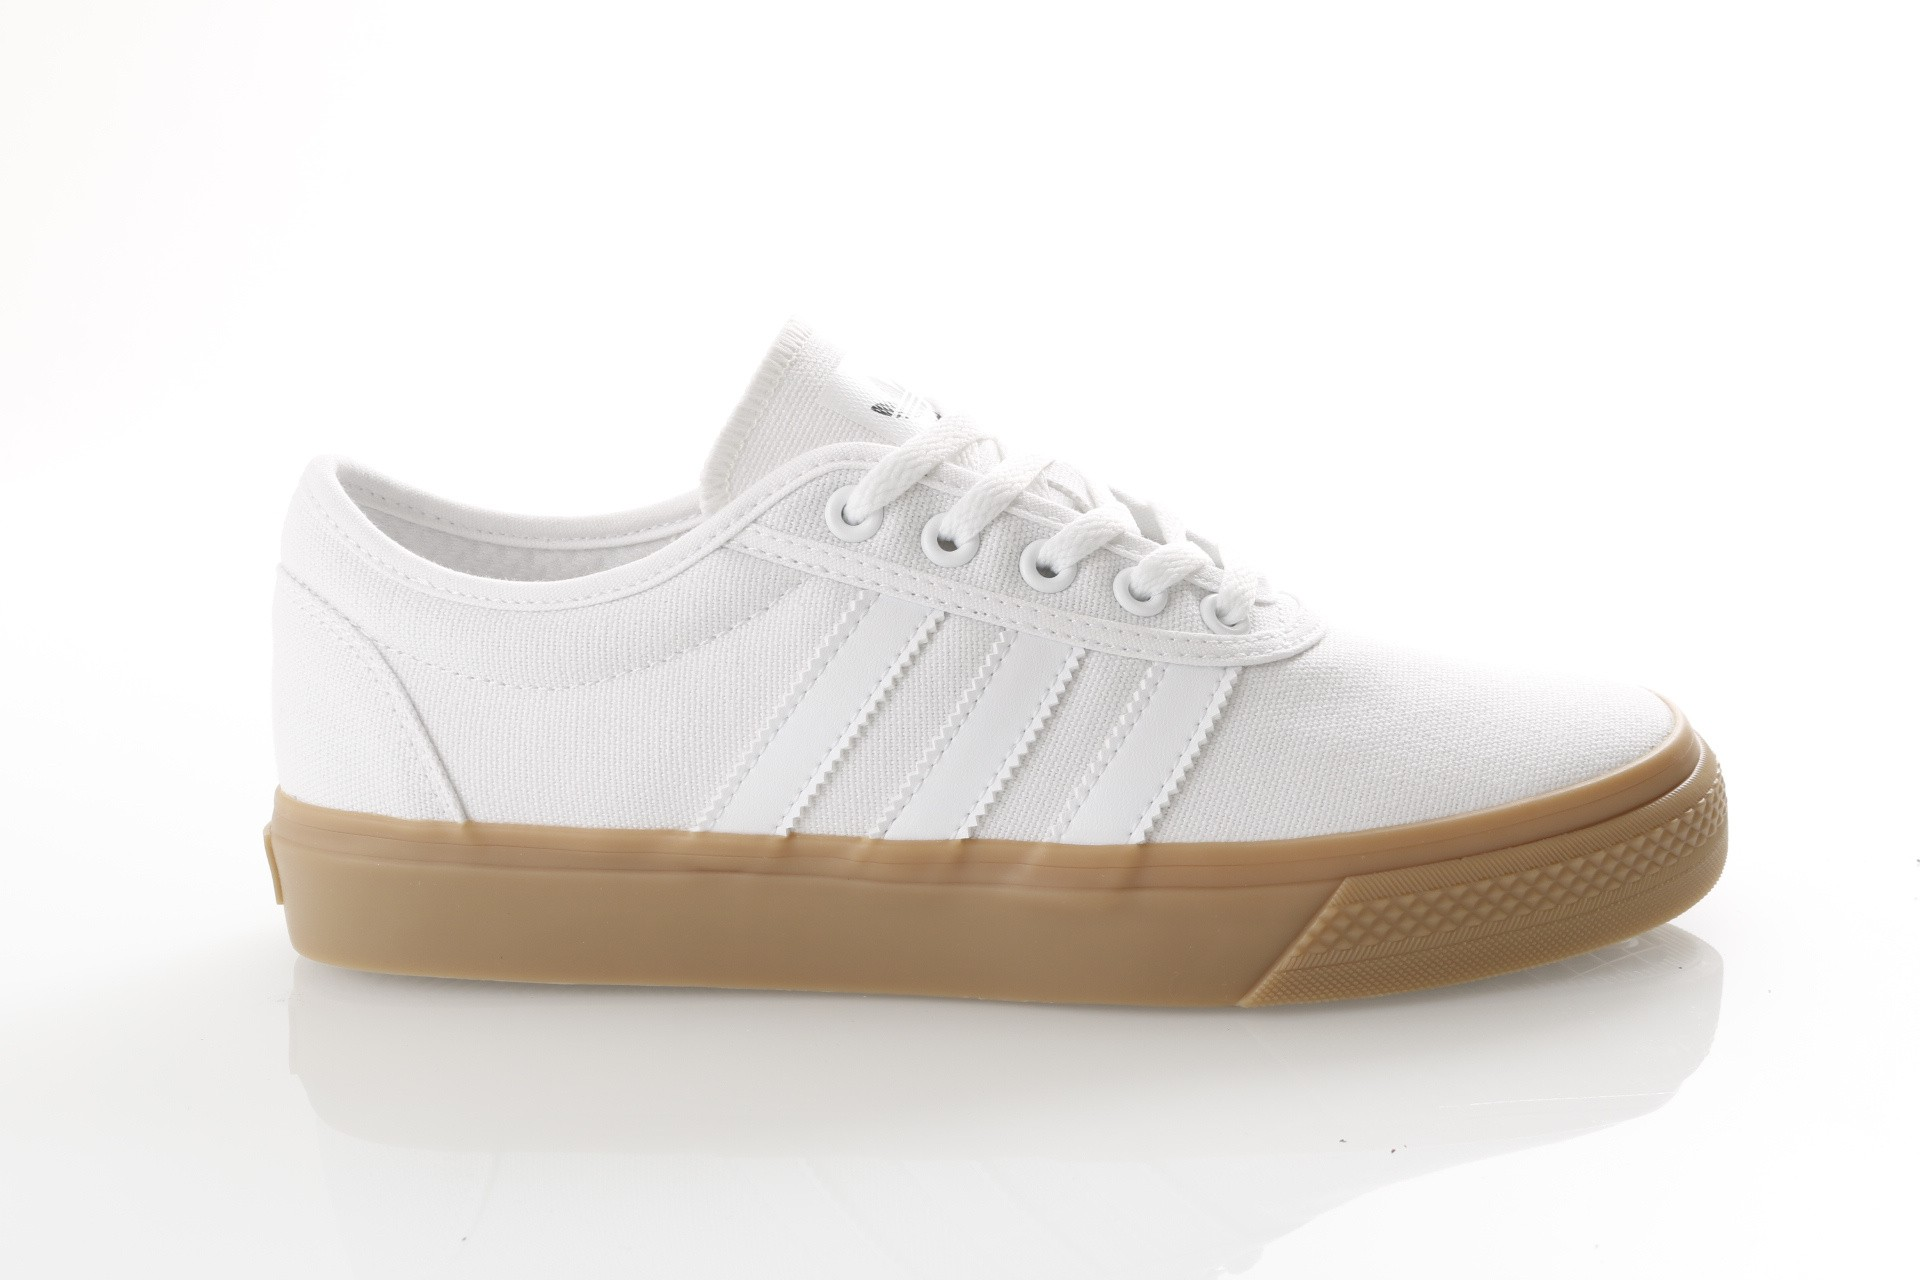 Foto van Adidas ADI-EASE DB3110 Sneakers ftwr white/core black/GUM4